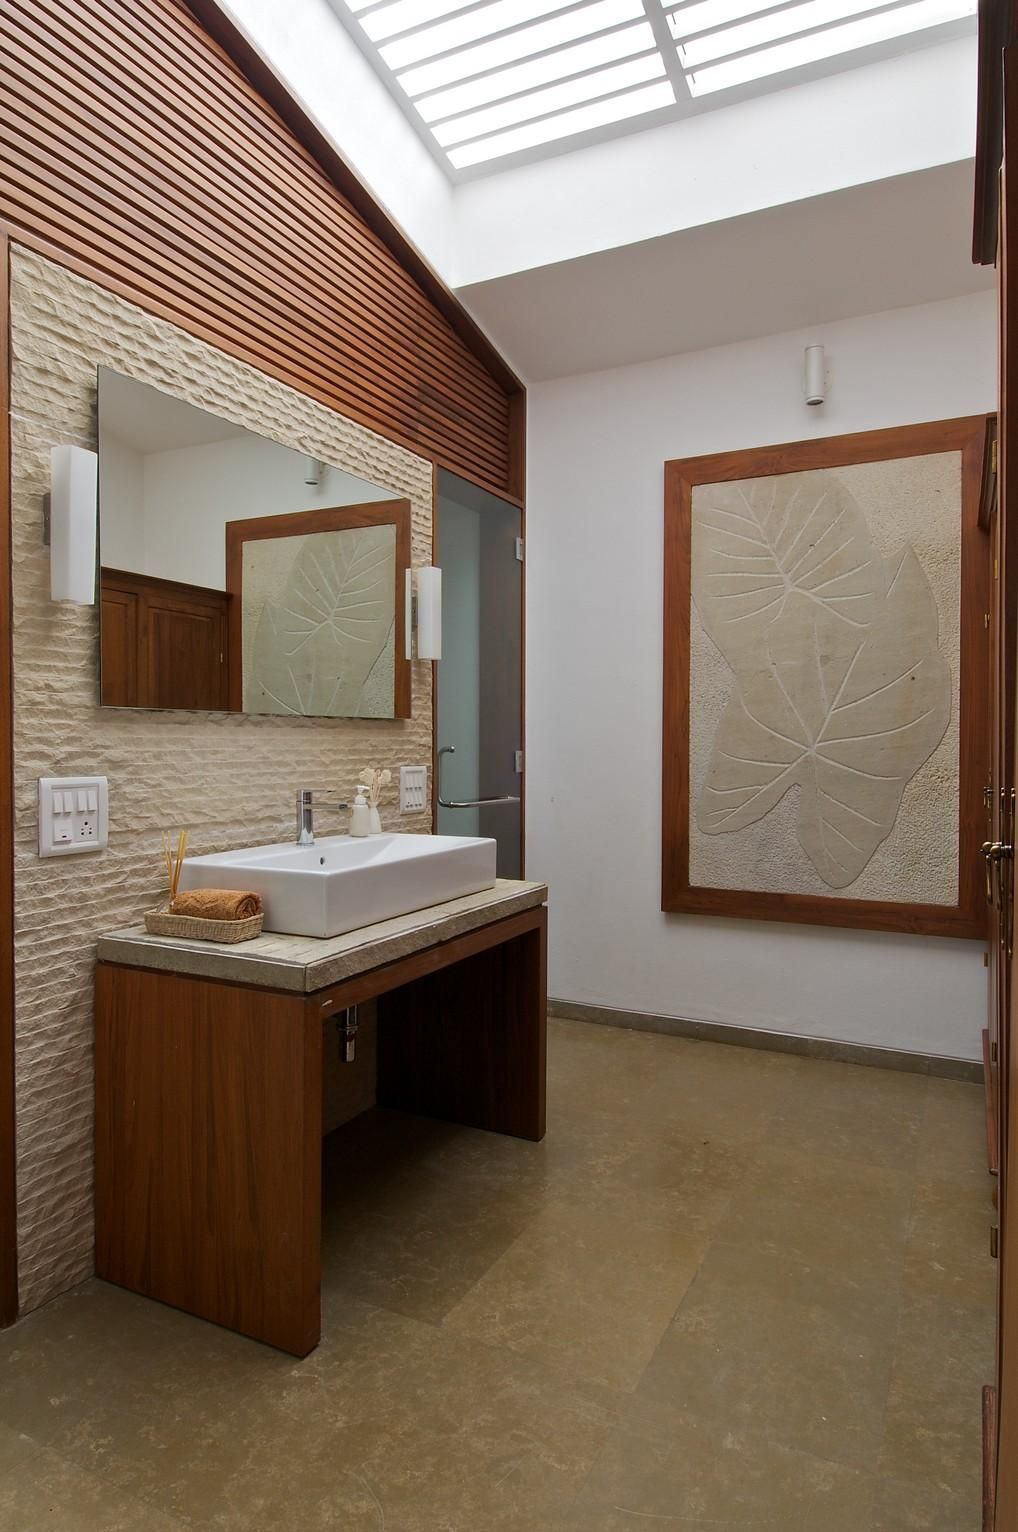 Anish amin house by atelier dnd bathroom pinterest atelier